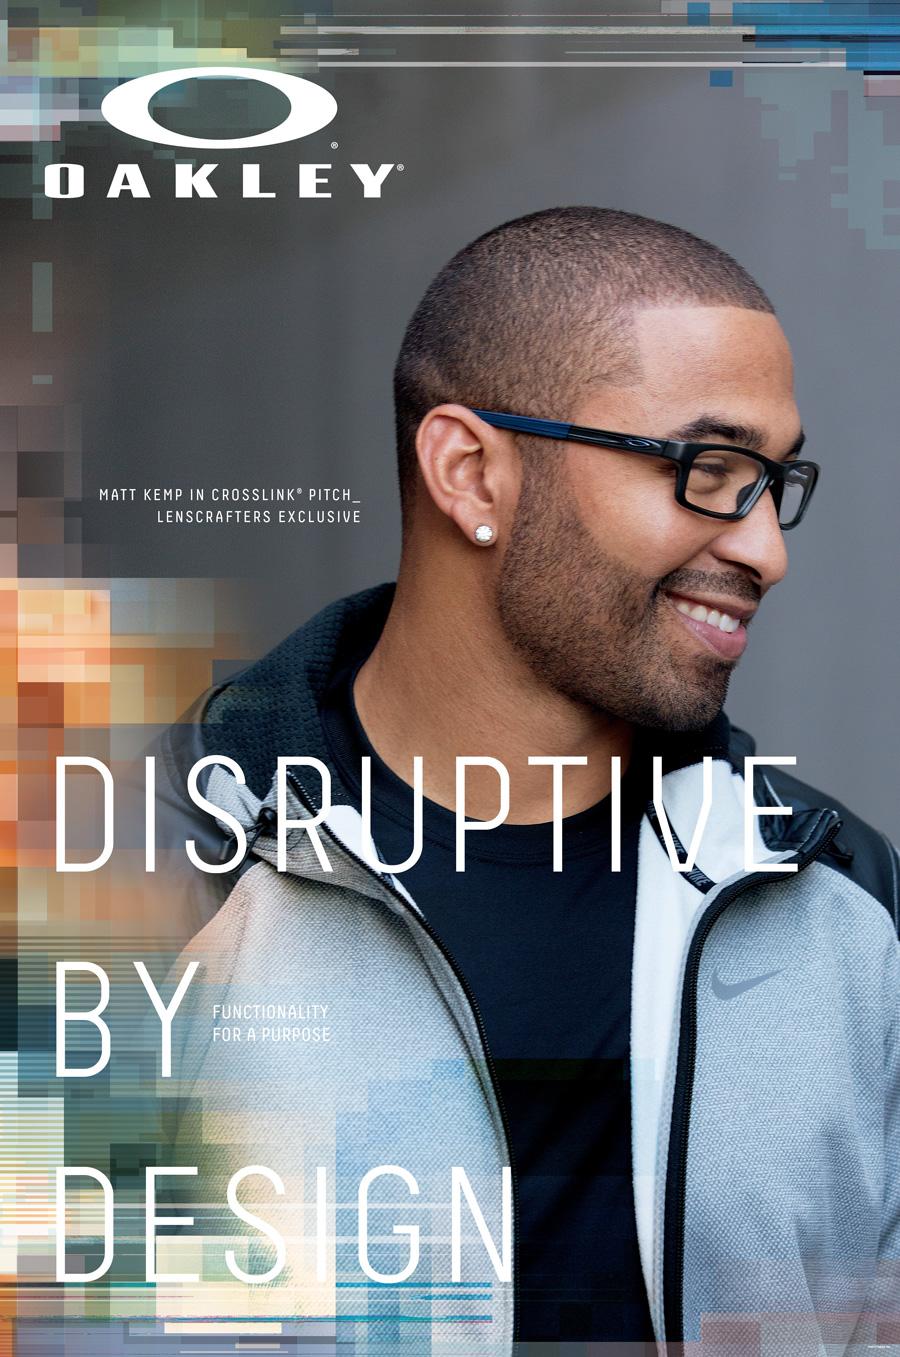 oakley-disruptive-web